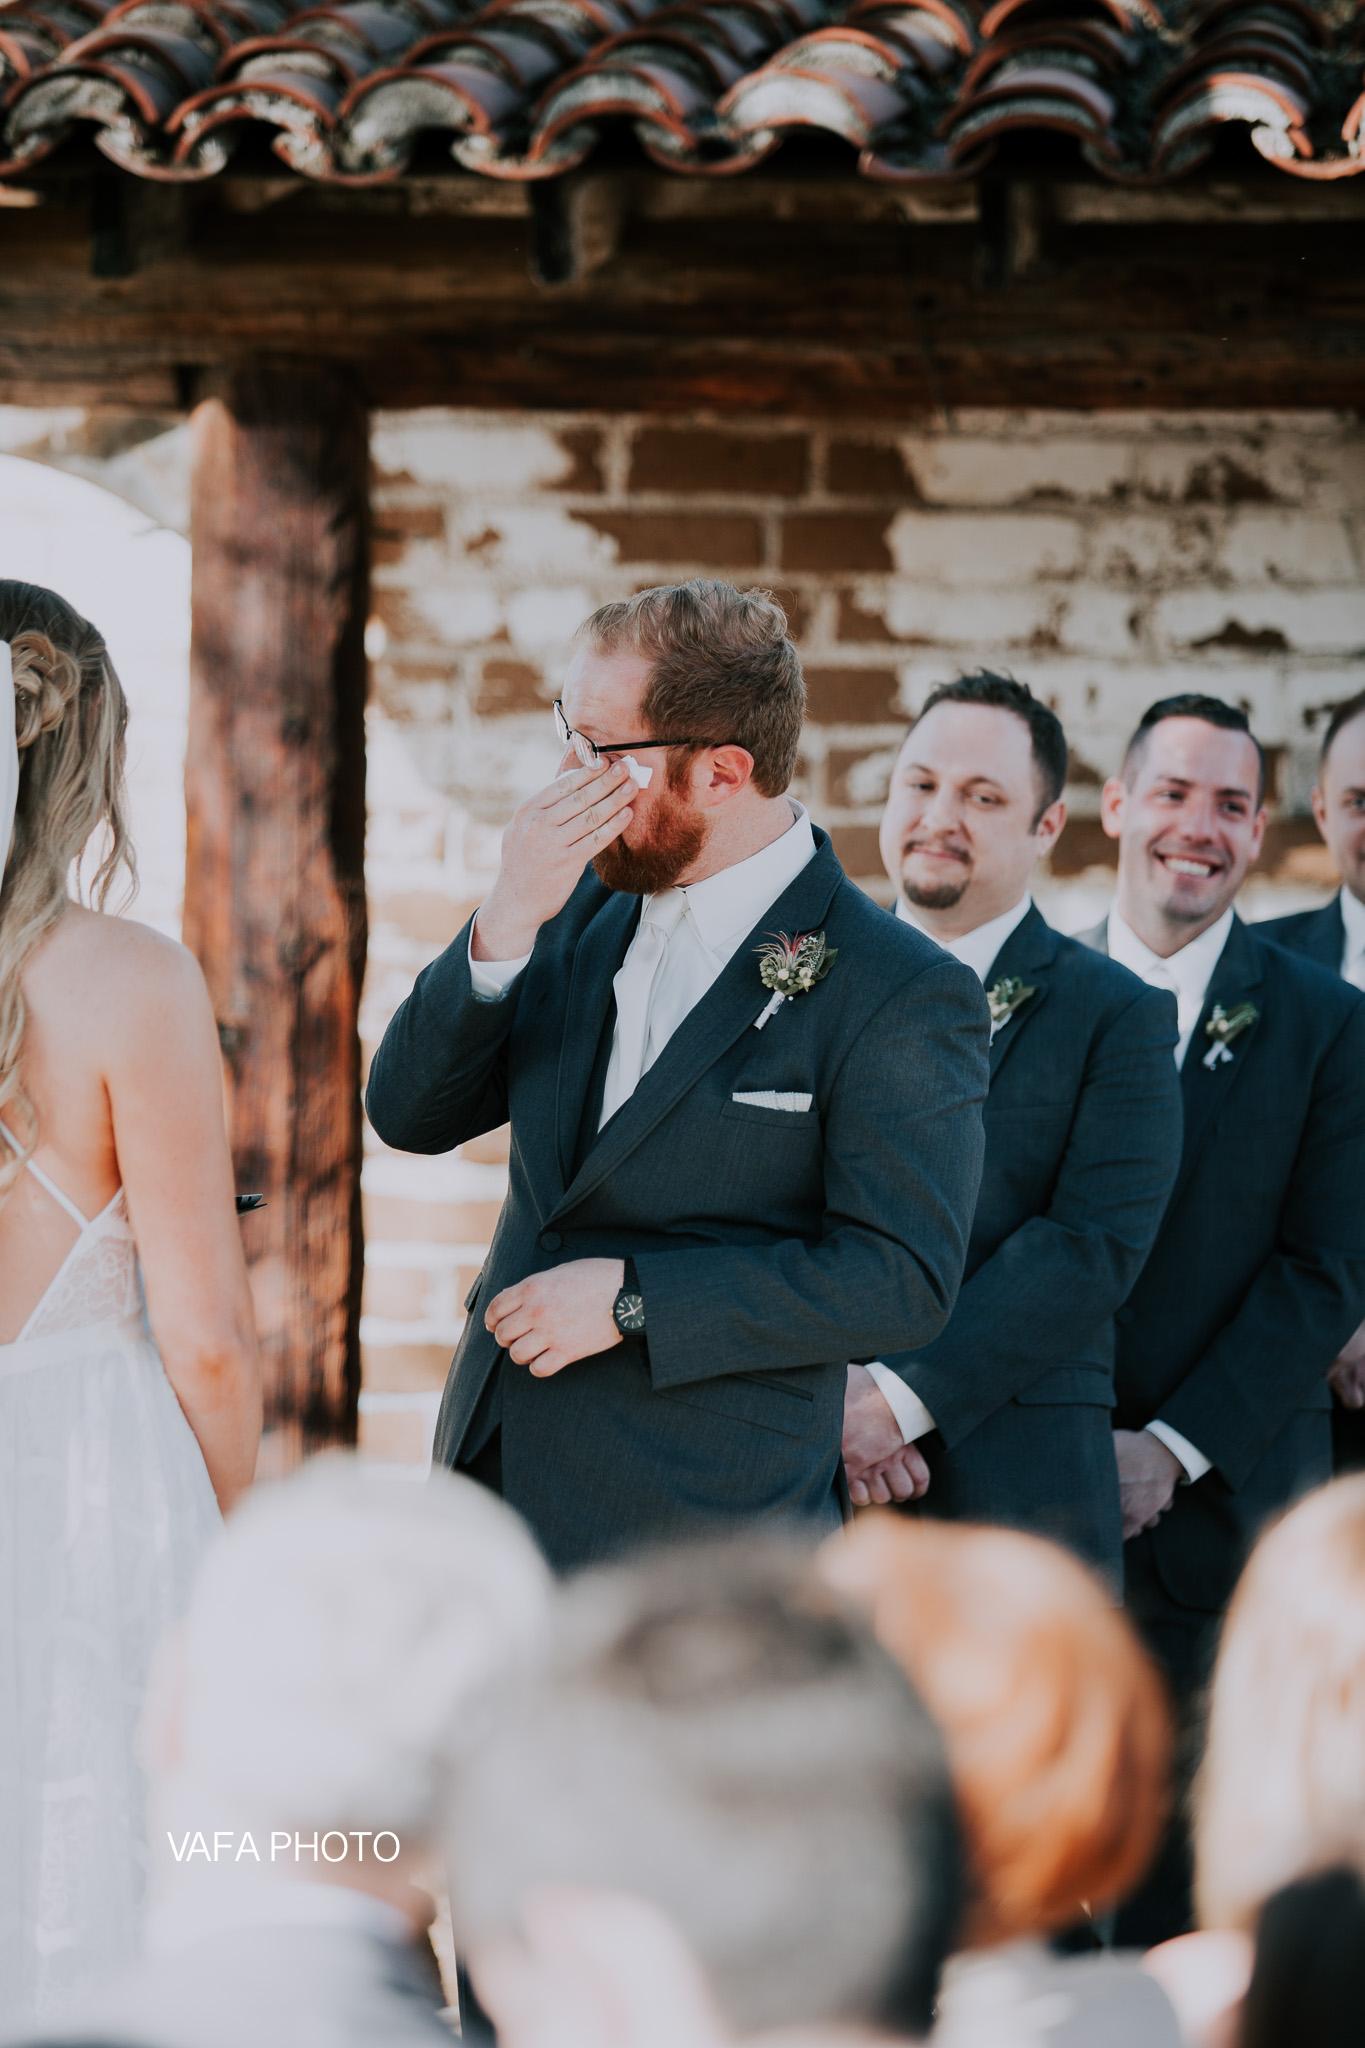 Leo-Carrillo-Ranch-Wedding-Lauren-Mike-Vafa-Photo-585.jpg